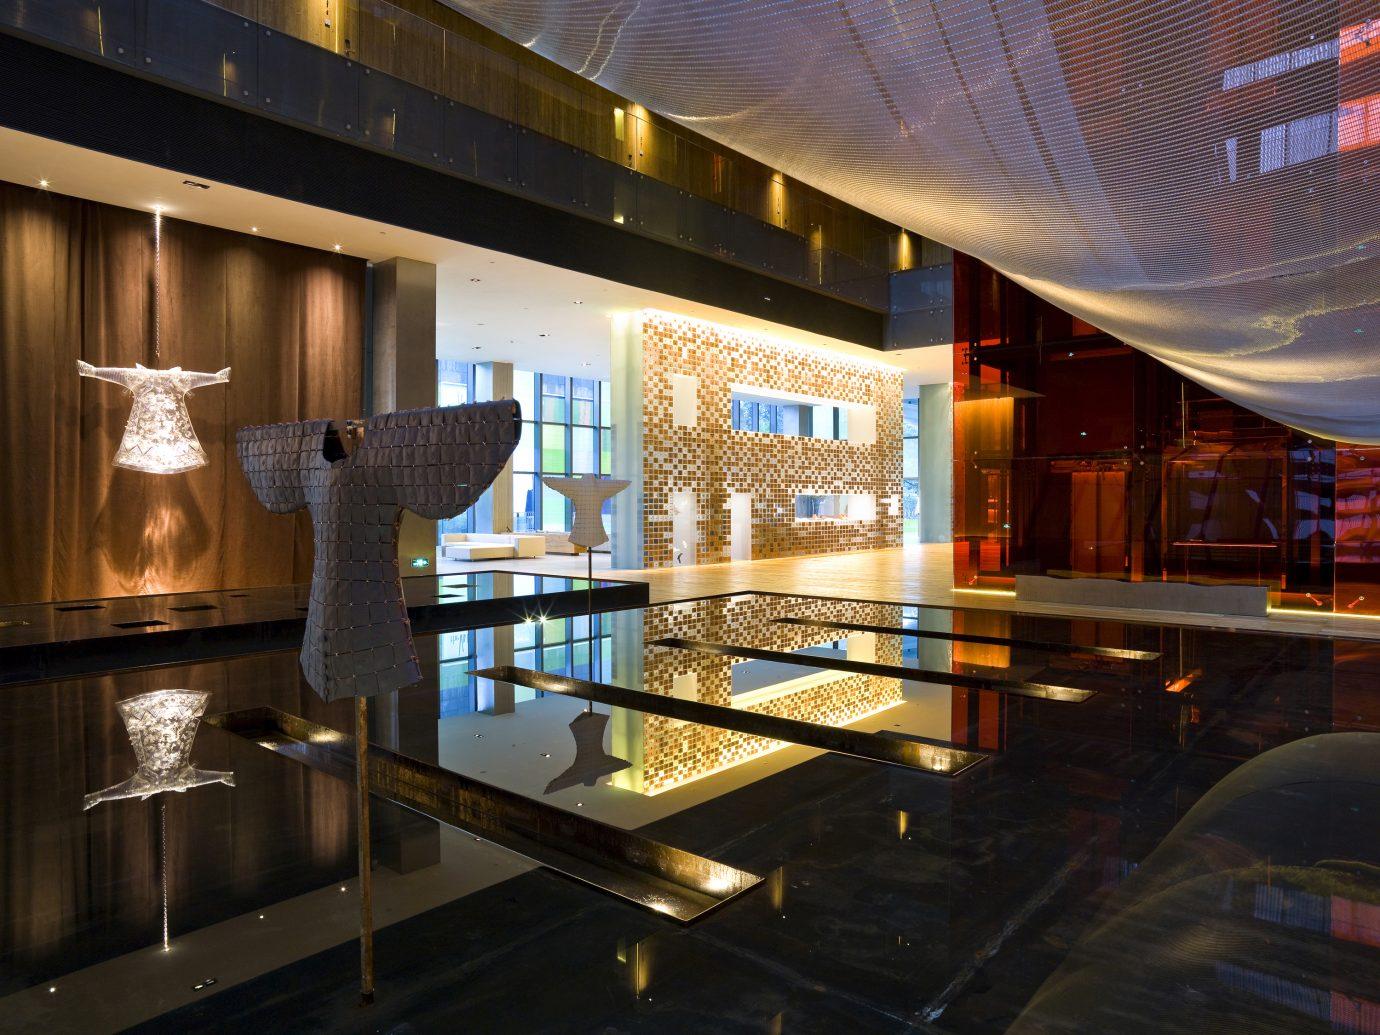 Atrium of The Opposite House in Beijing